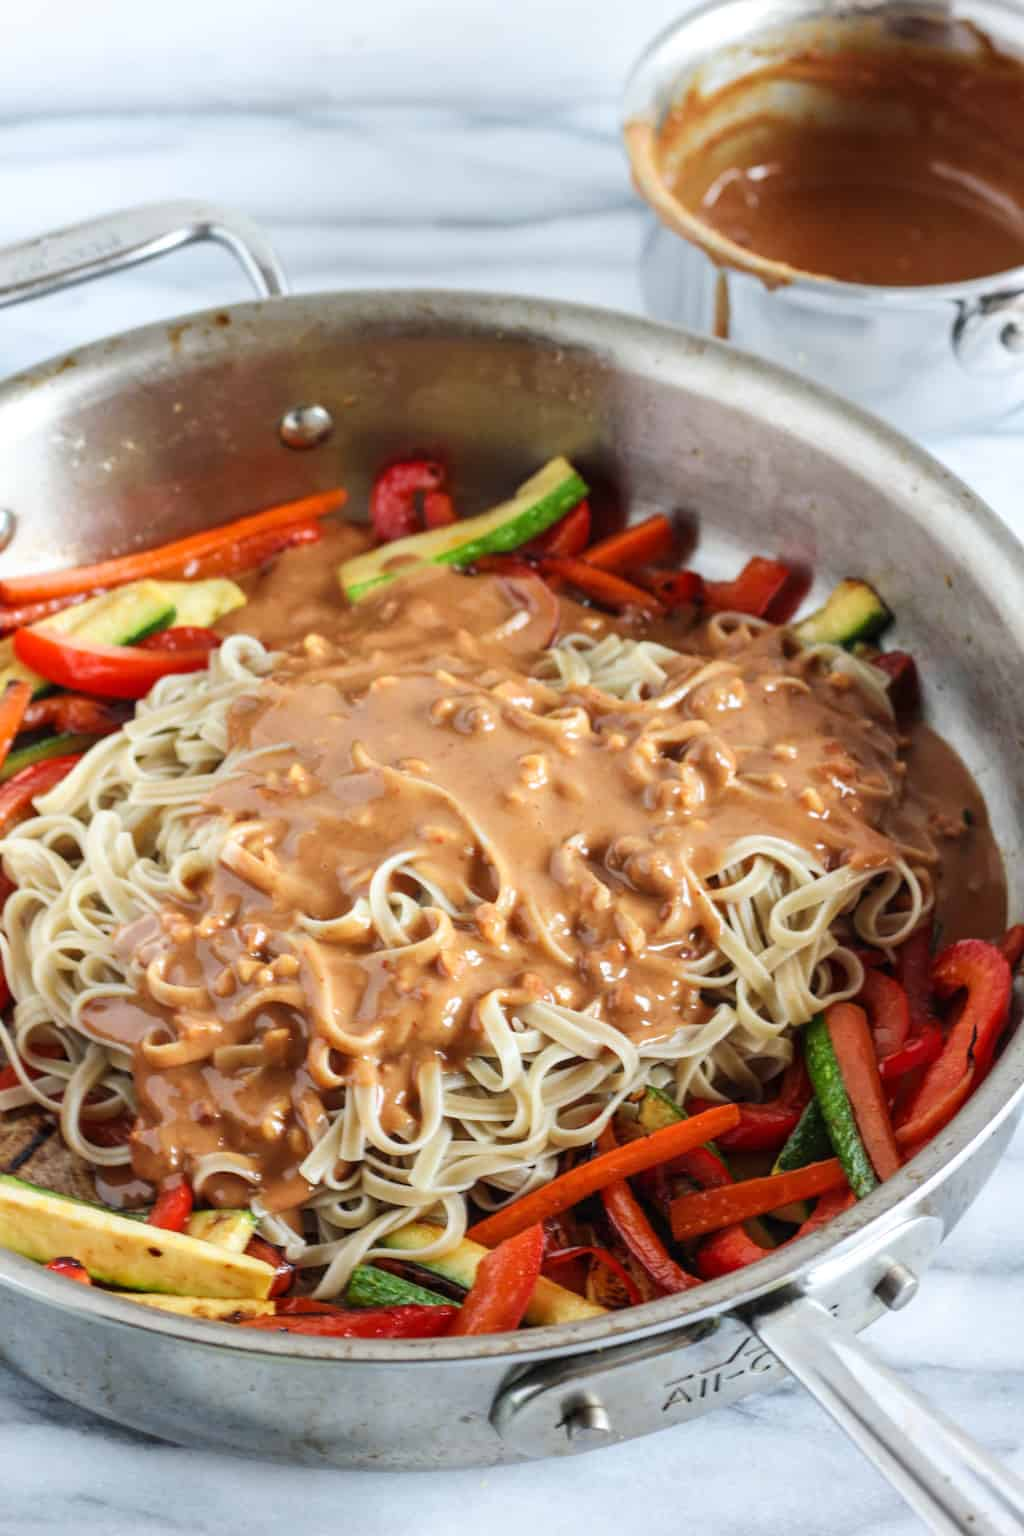 Lotus Foods New Pad Thai Noodles